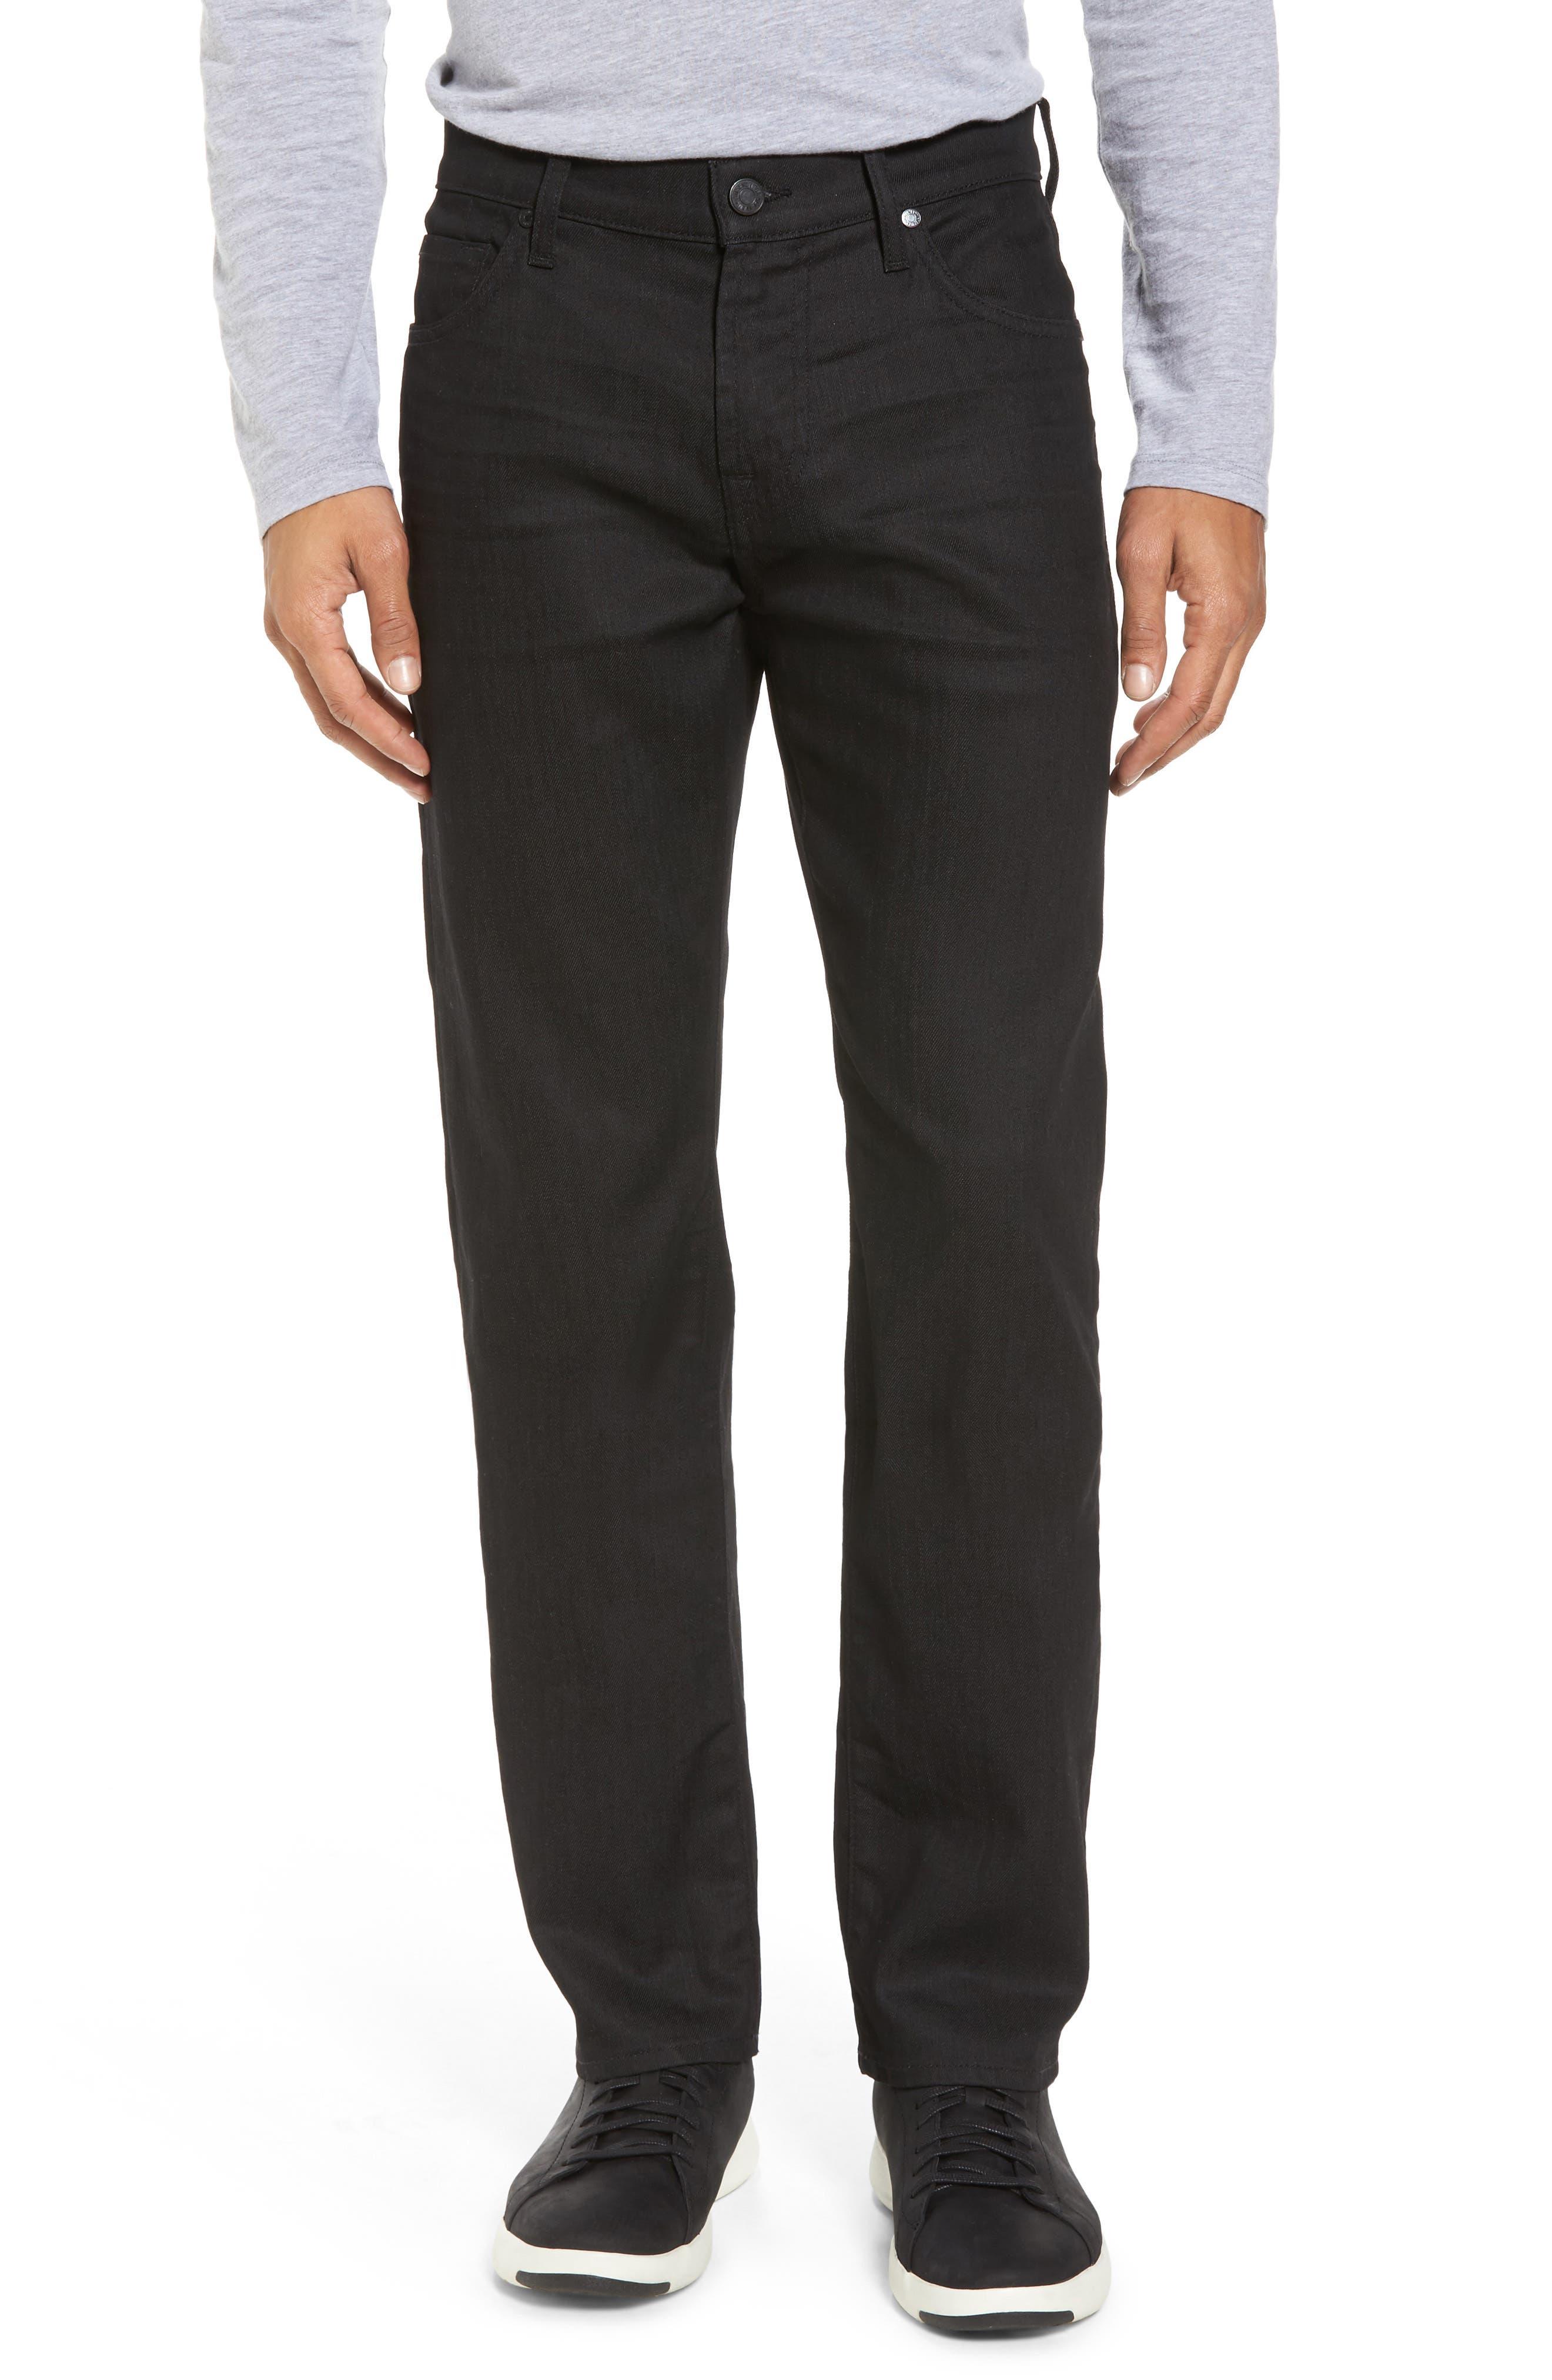 Airweft - Slimmy Slim Fit Jeans,                             Main thumbnail 1, color,                             004